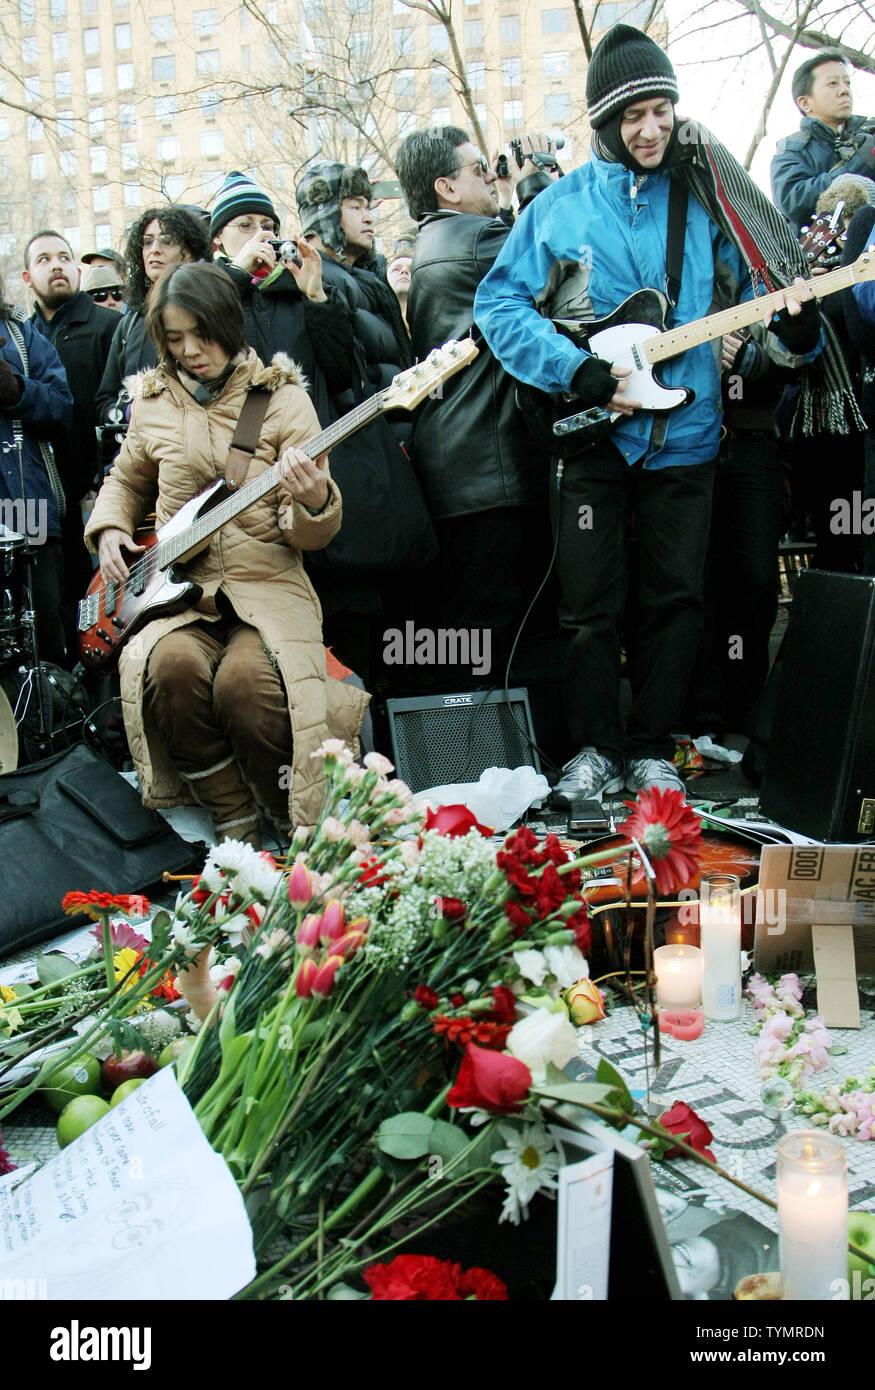 Muscians play Beatles songs as John Lennon fans gather